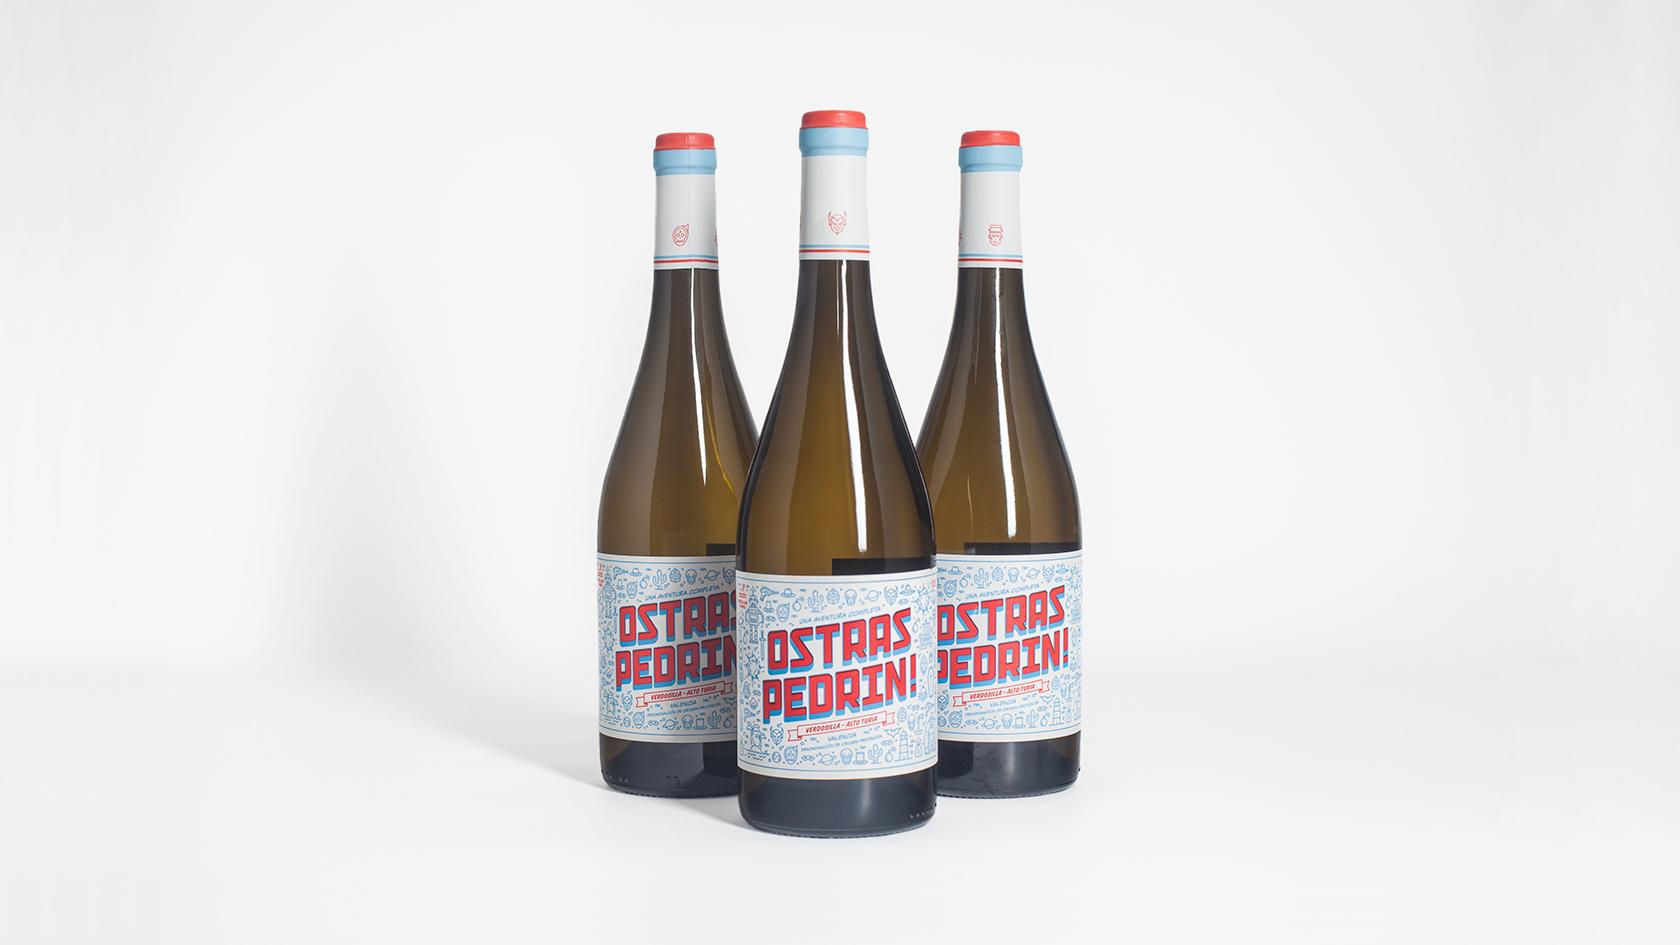 pixelarte-diseno-grafico-botella-vino-Ostras_pedrin-Bodega-Vicente_Gandia